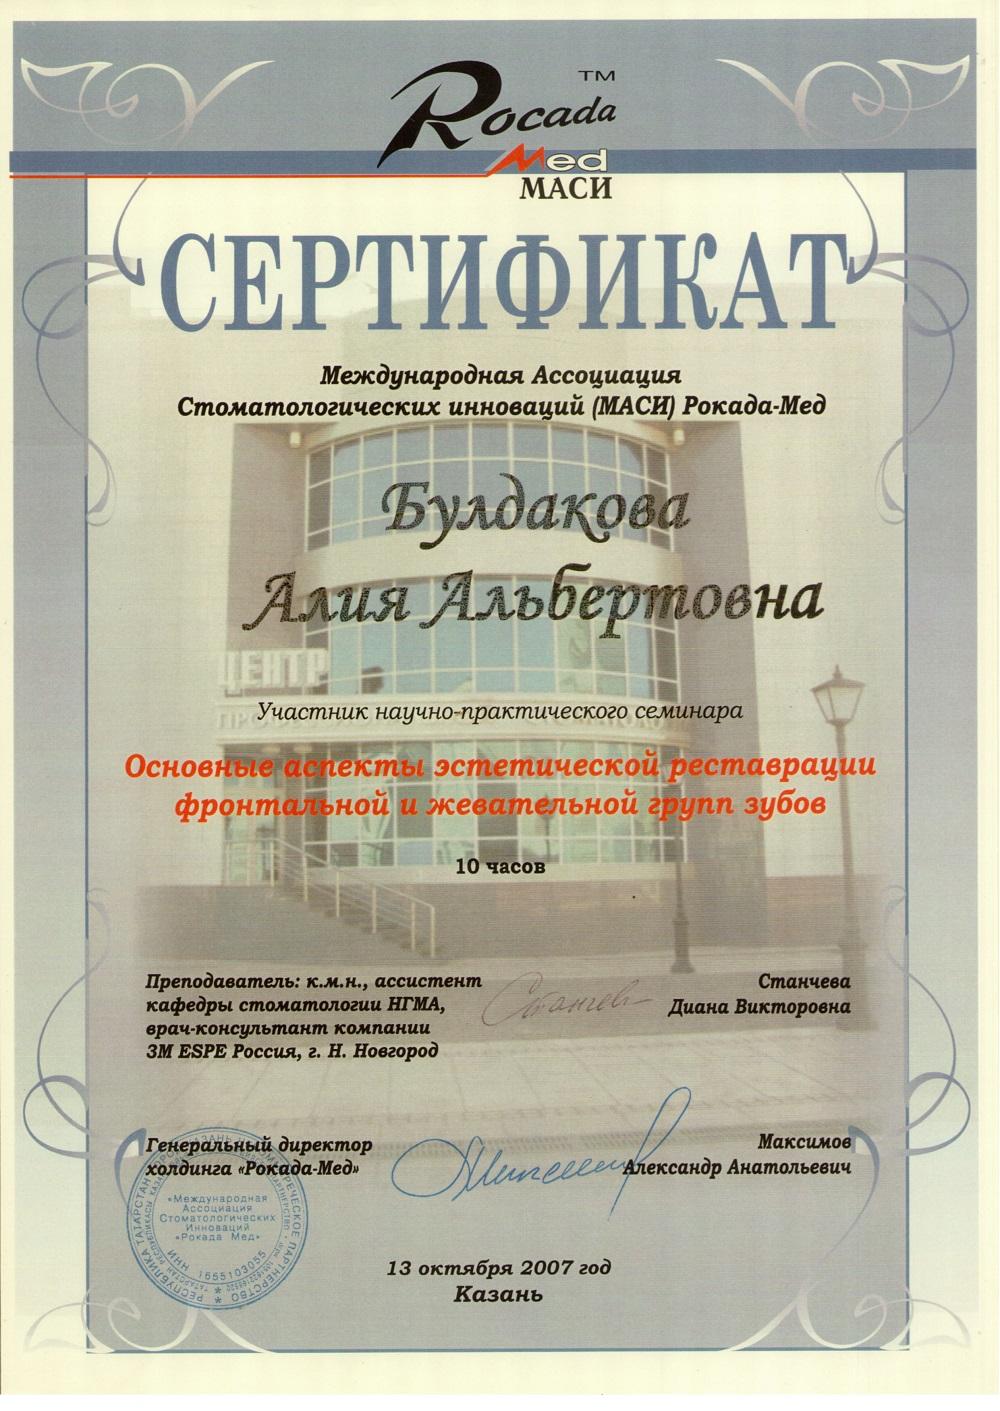 Сертификат Rocada med маси